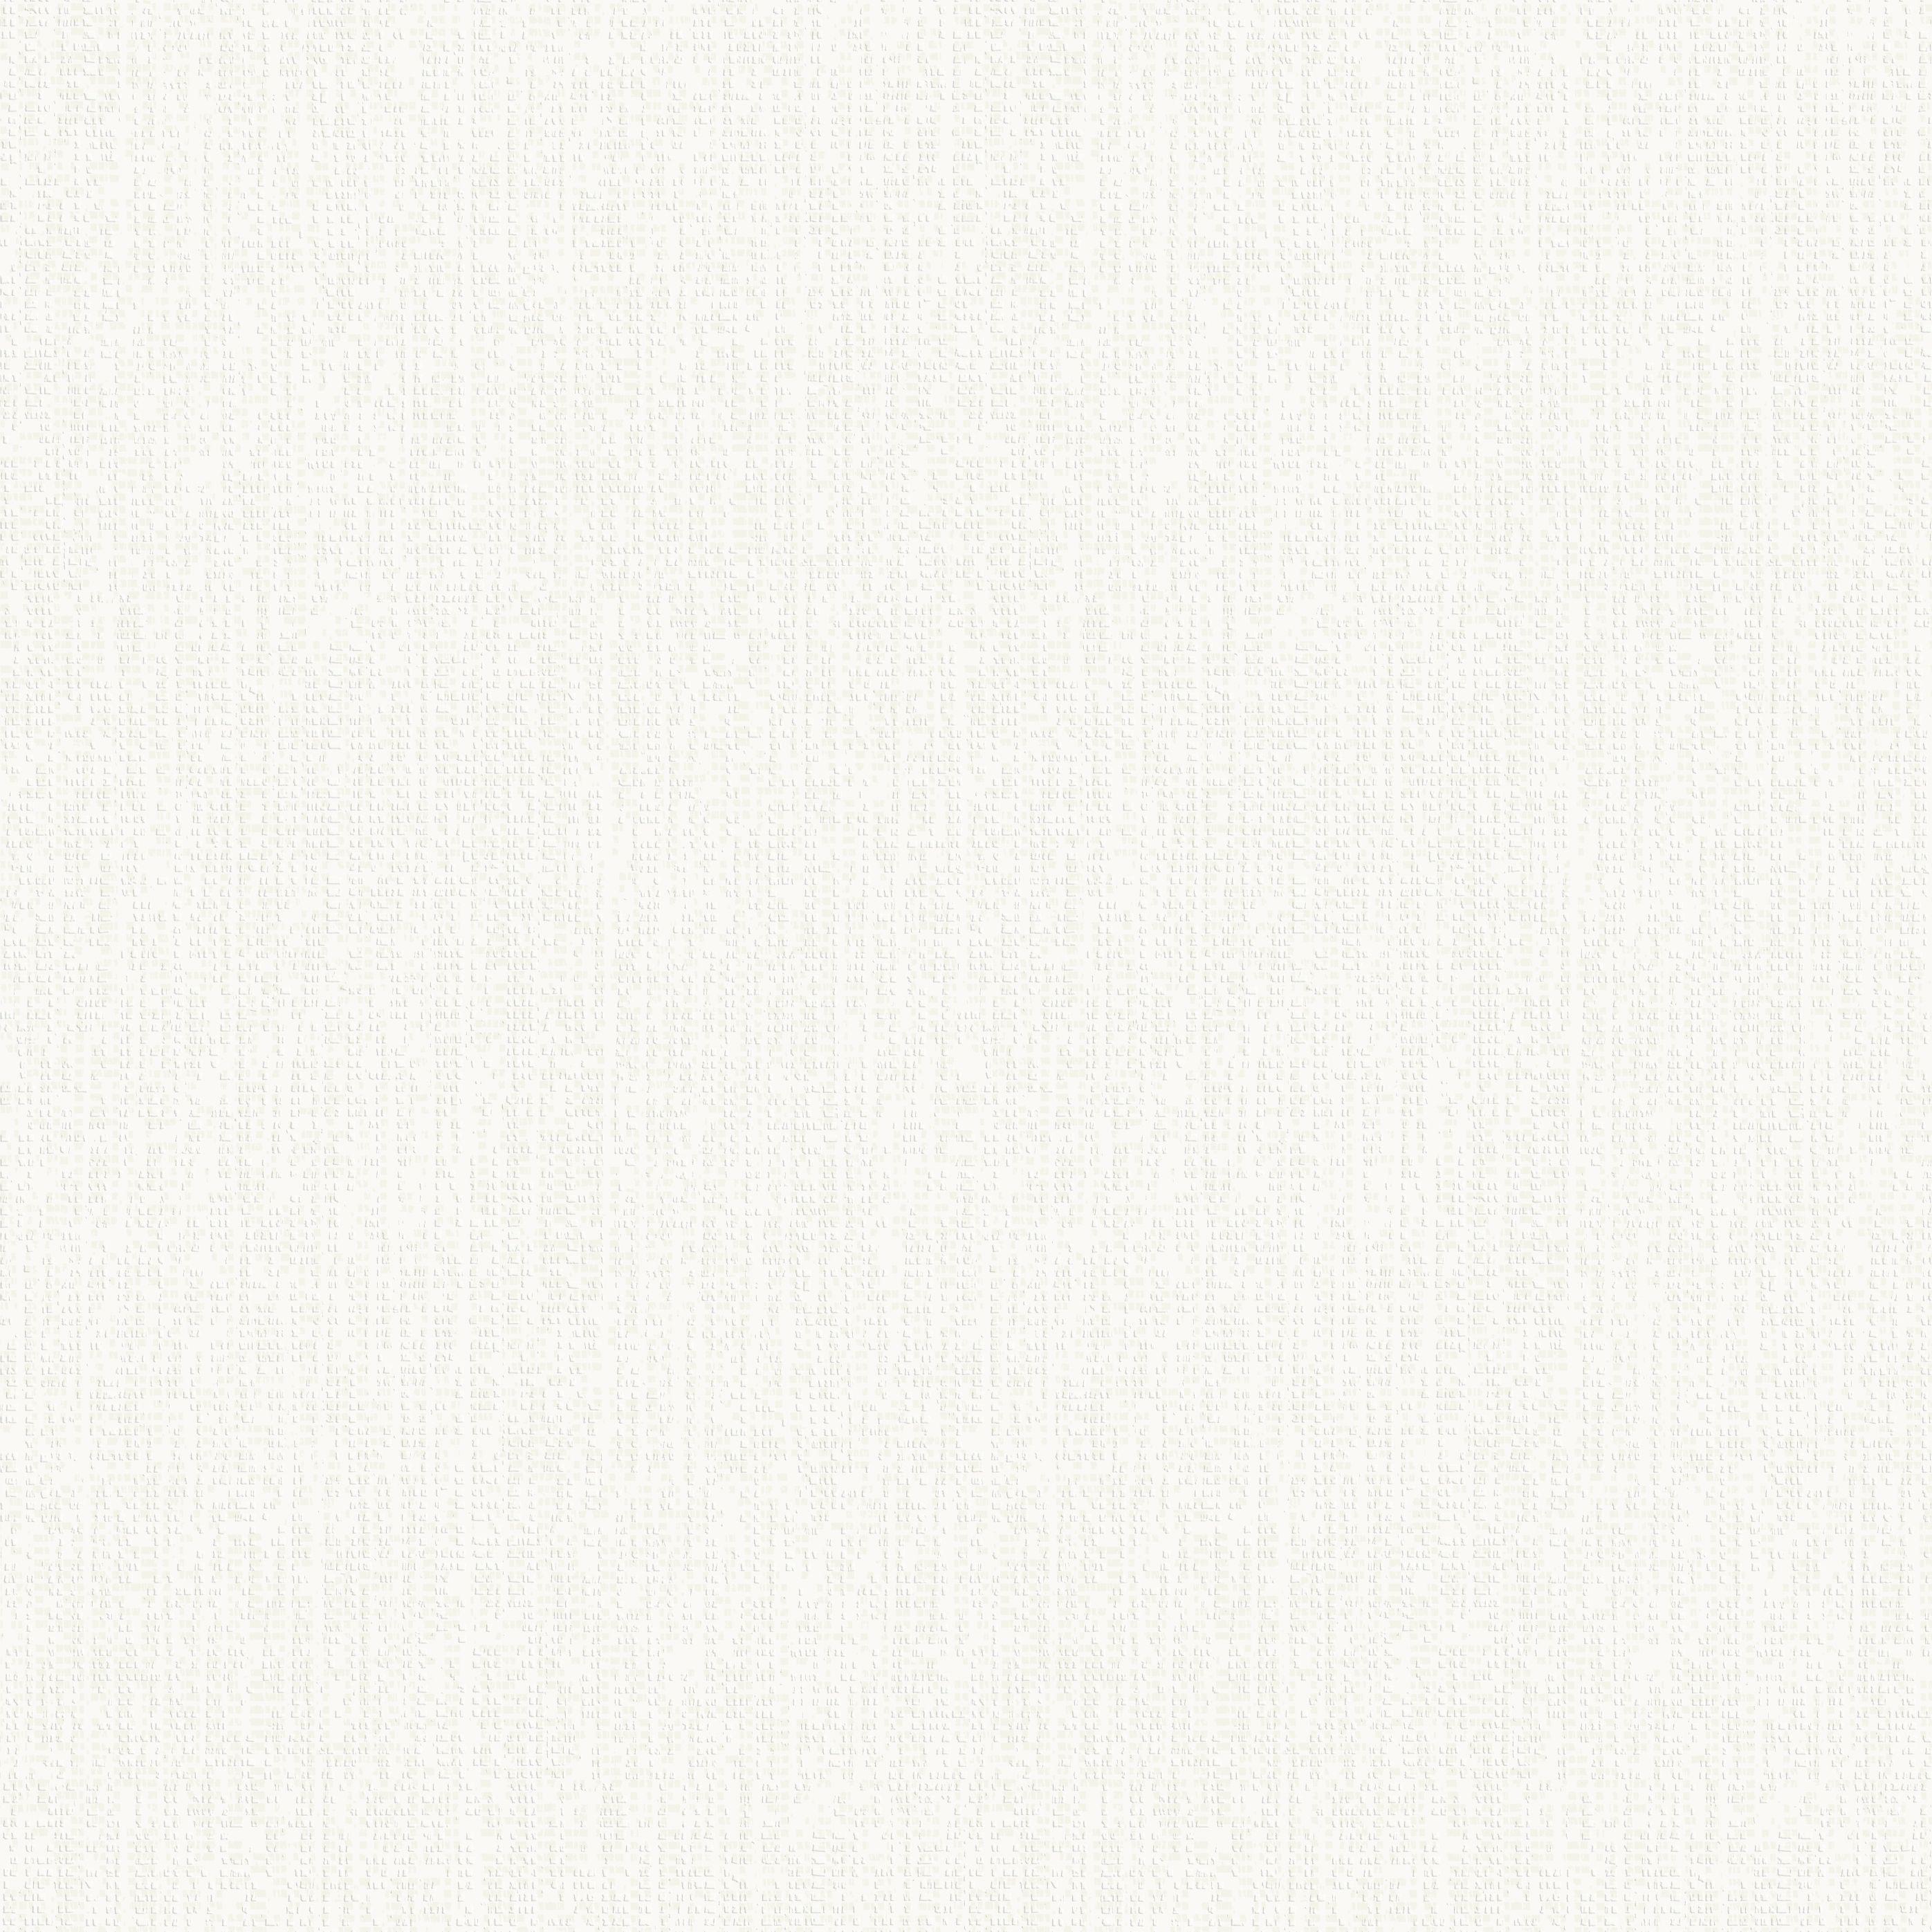 Superfresco White Matrix Textured Wallpaper Departments